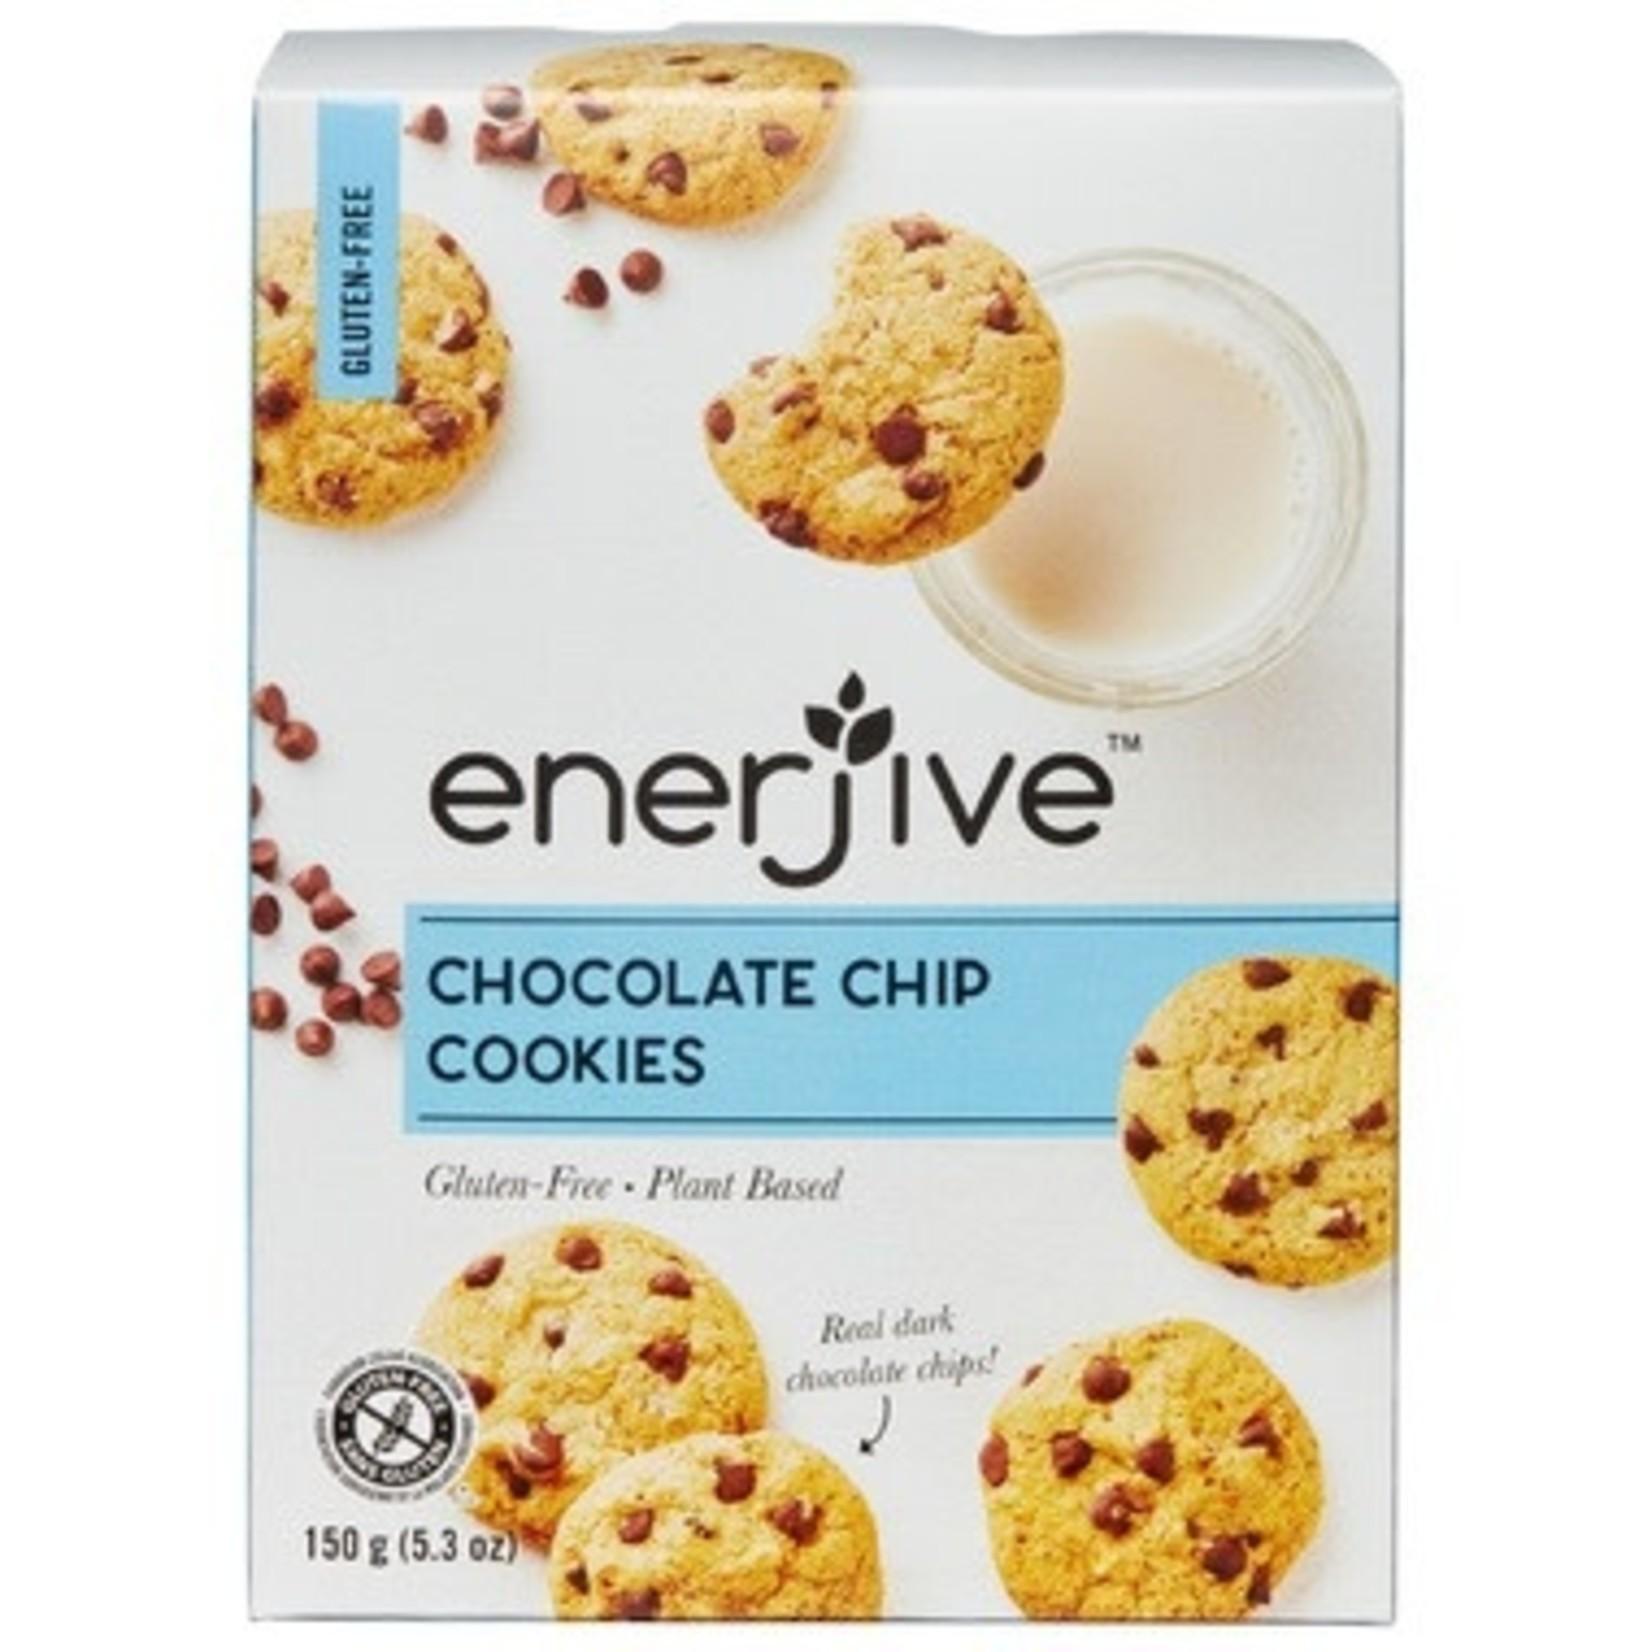 Enerjive Enerjive Chocolate Chip Cookies